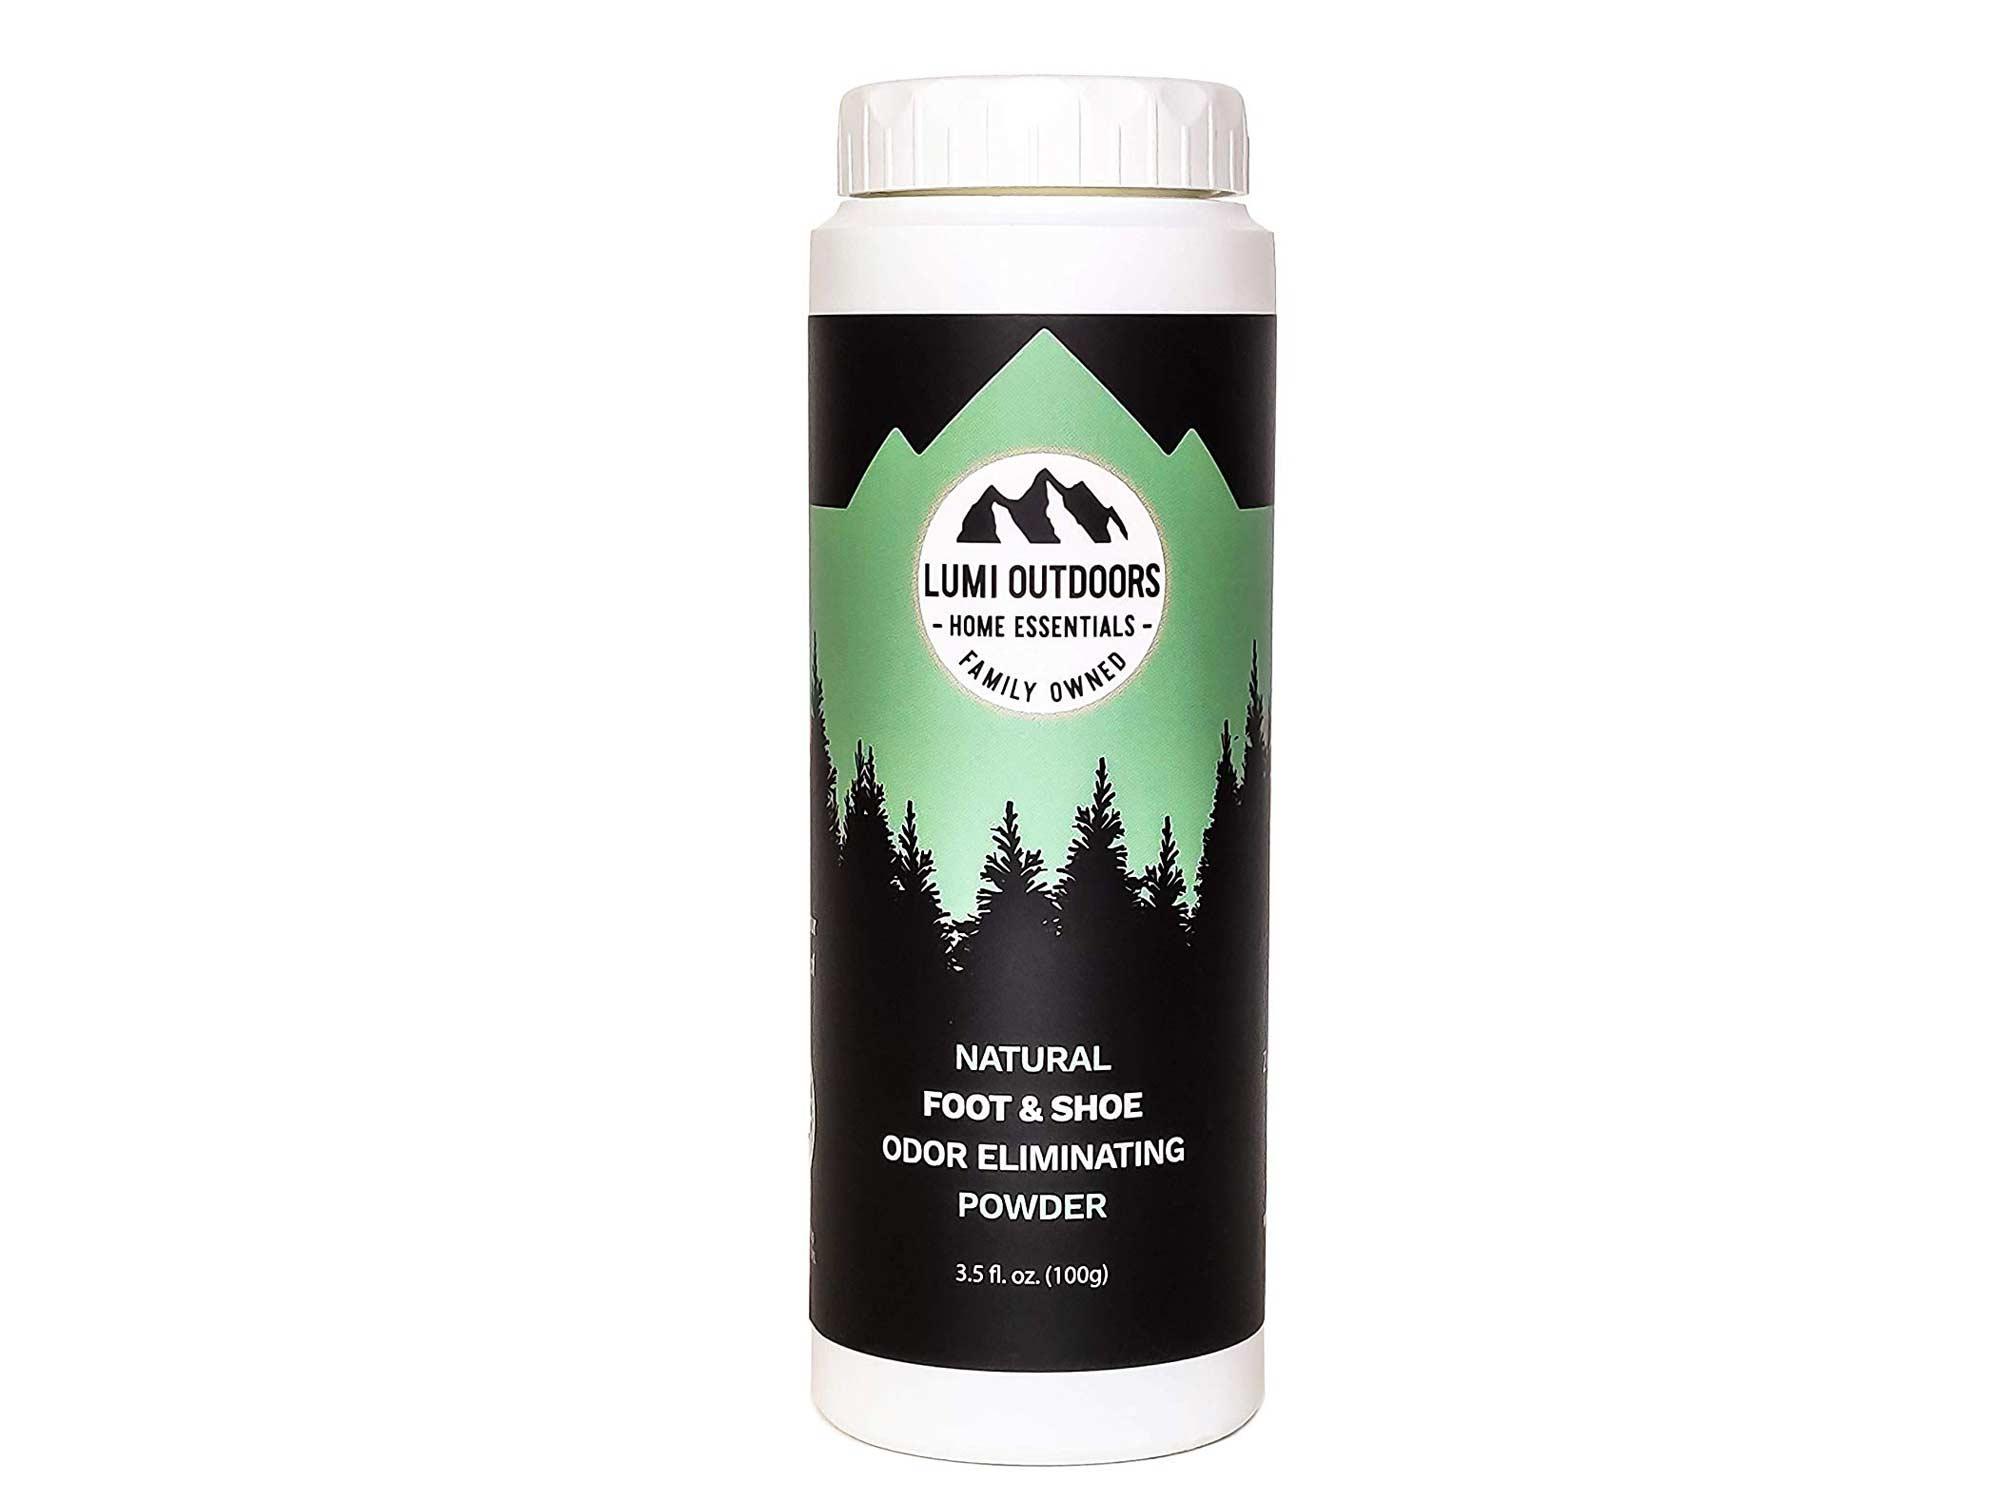 Lumi foot powder